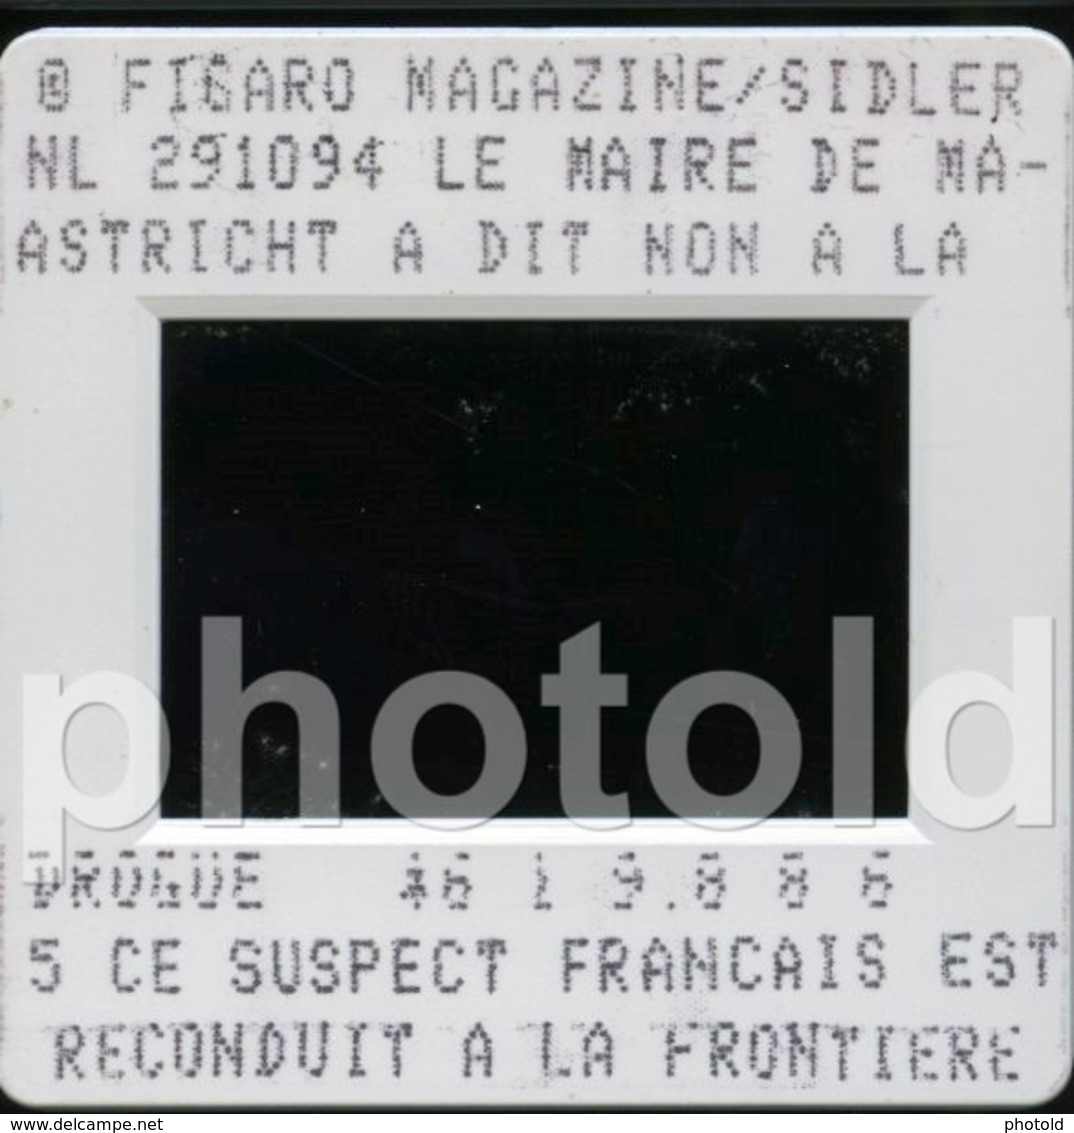 1994 OPEL POLICE KONINKLIJKE MARECHAAUSSEE HOLLAND NETHERLANDS 35mm PRESS DIAPOSITIVE SLIDE Not PHOTO No FOTO B4921 - Dias